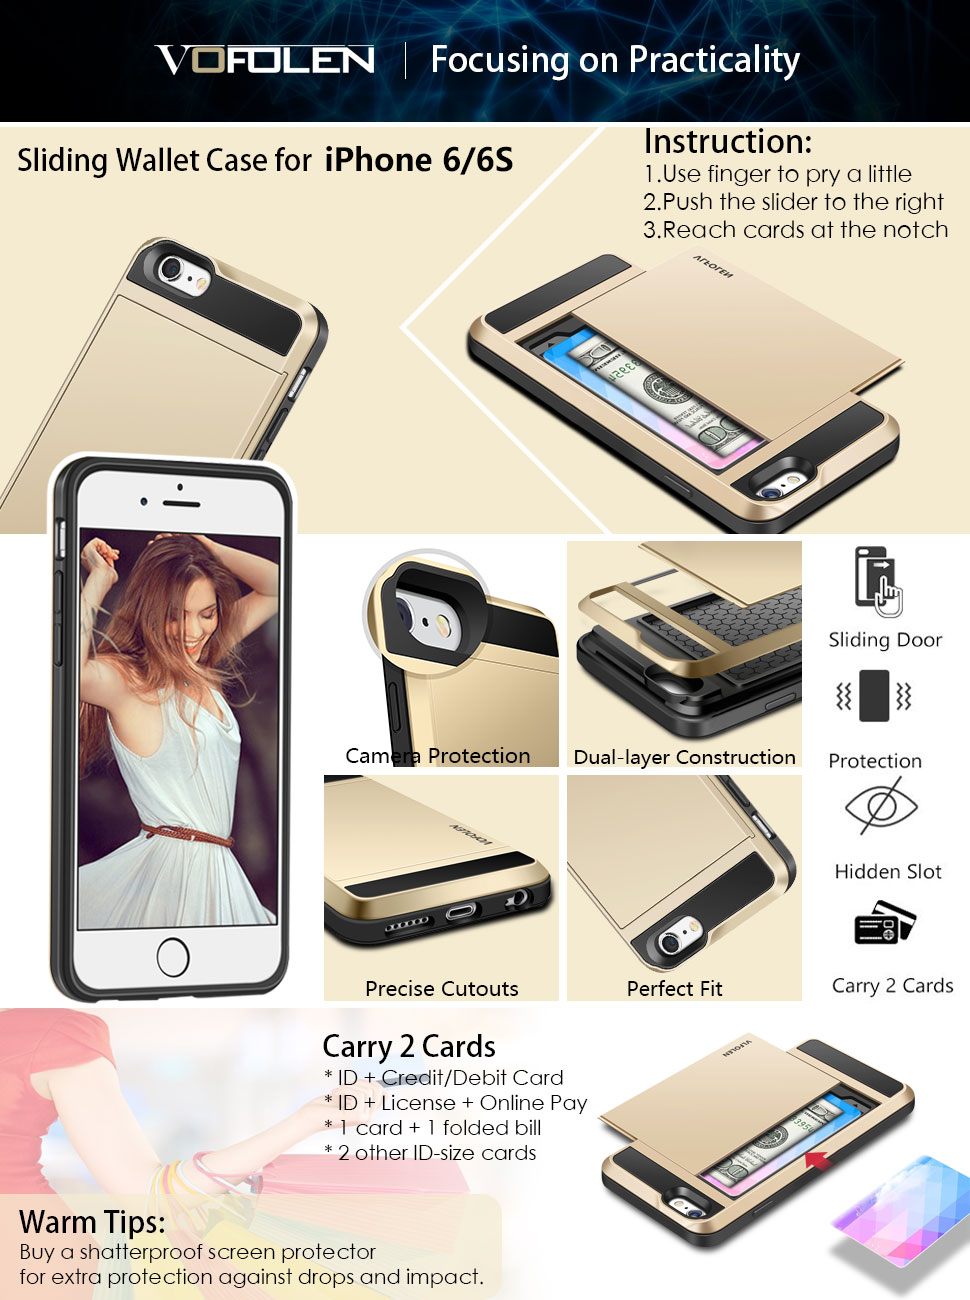 Iphone 6 Case Vofolen Impact Resistant Wallet Cover 2in1 Gravity Full Tempered Glass For Plus Sliding Hidden Pocket Card Holder 6s Gold